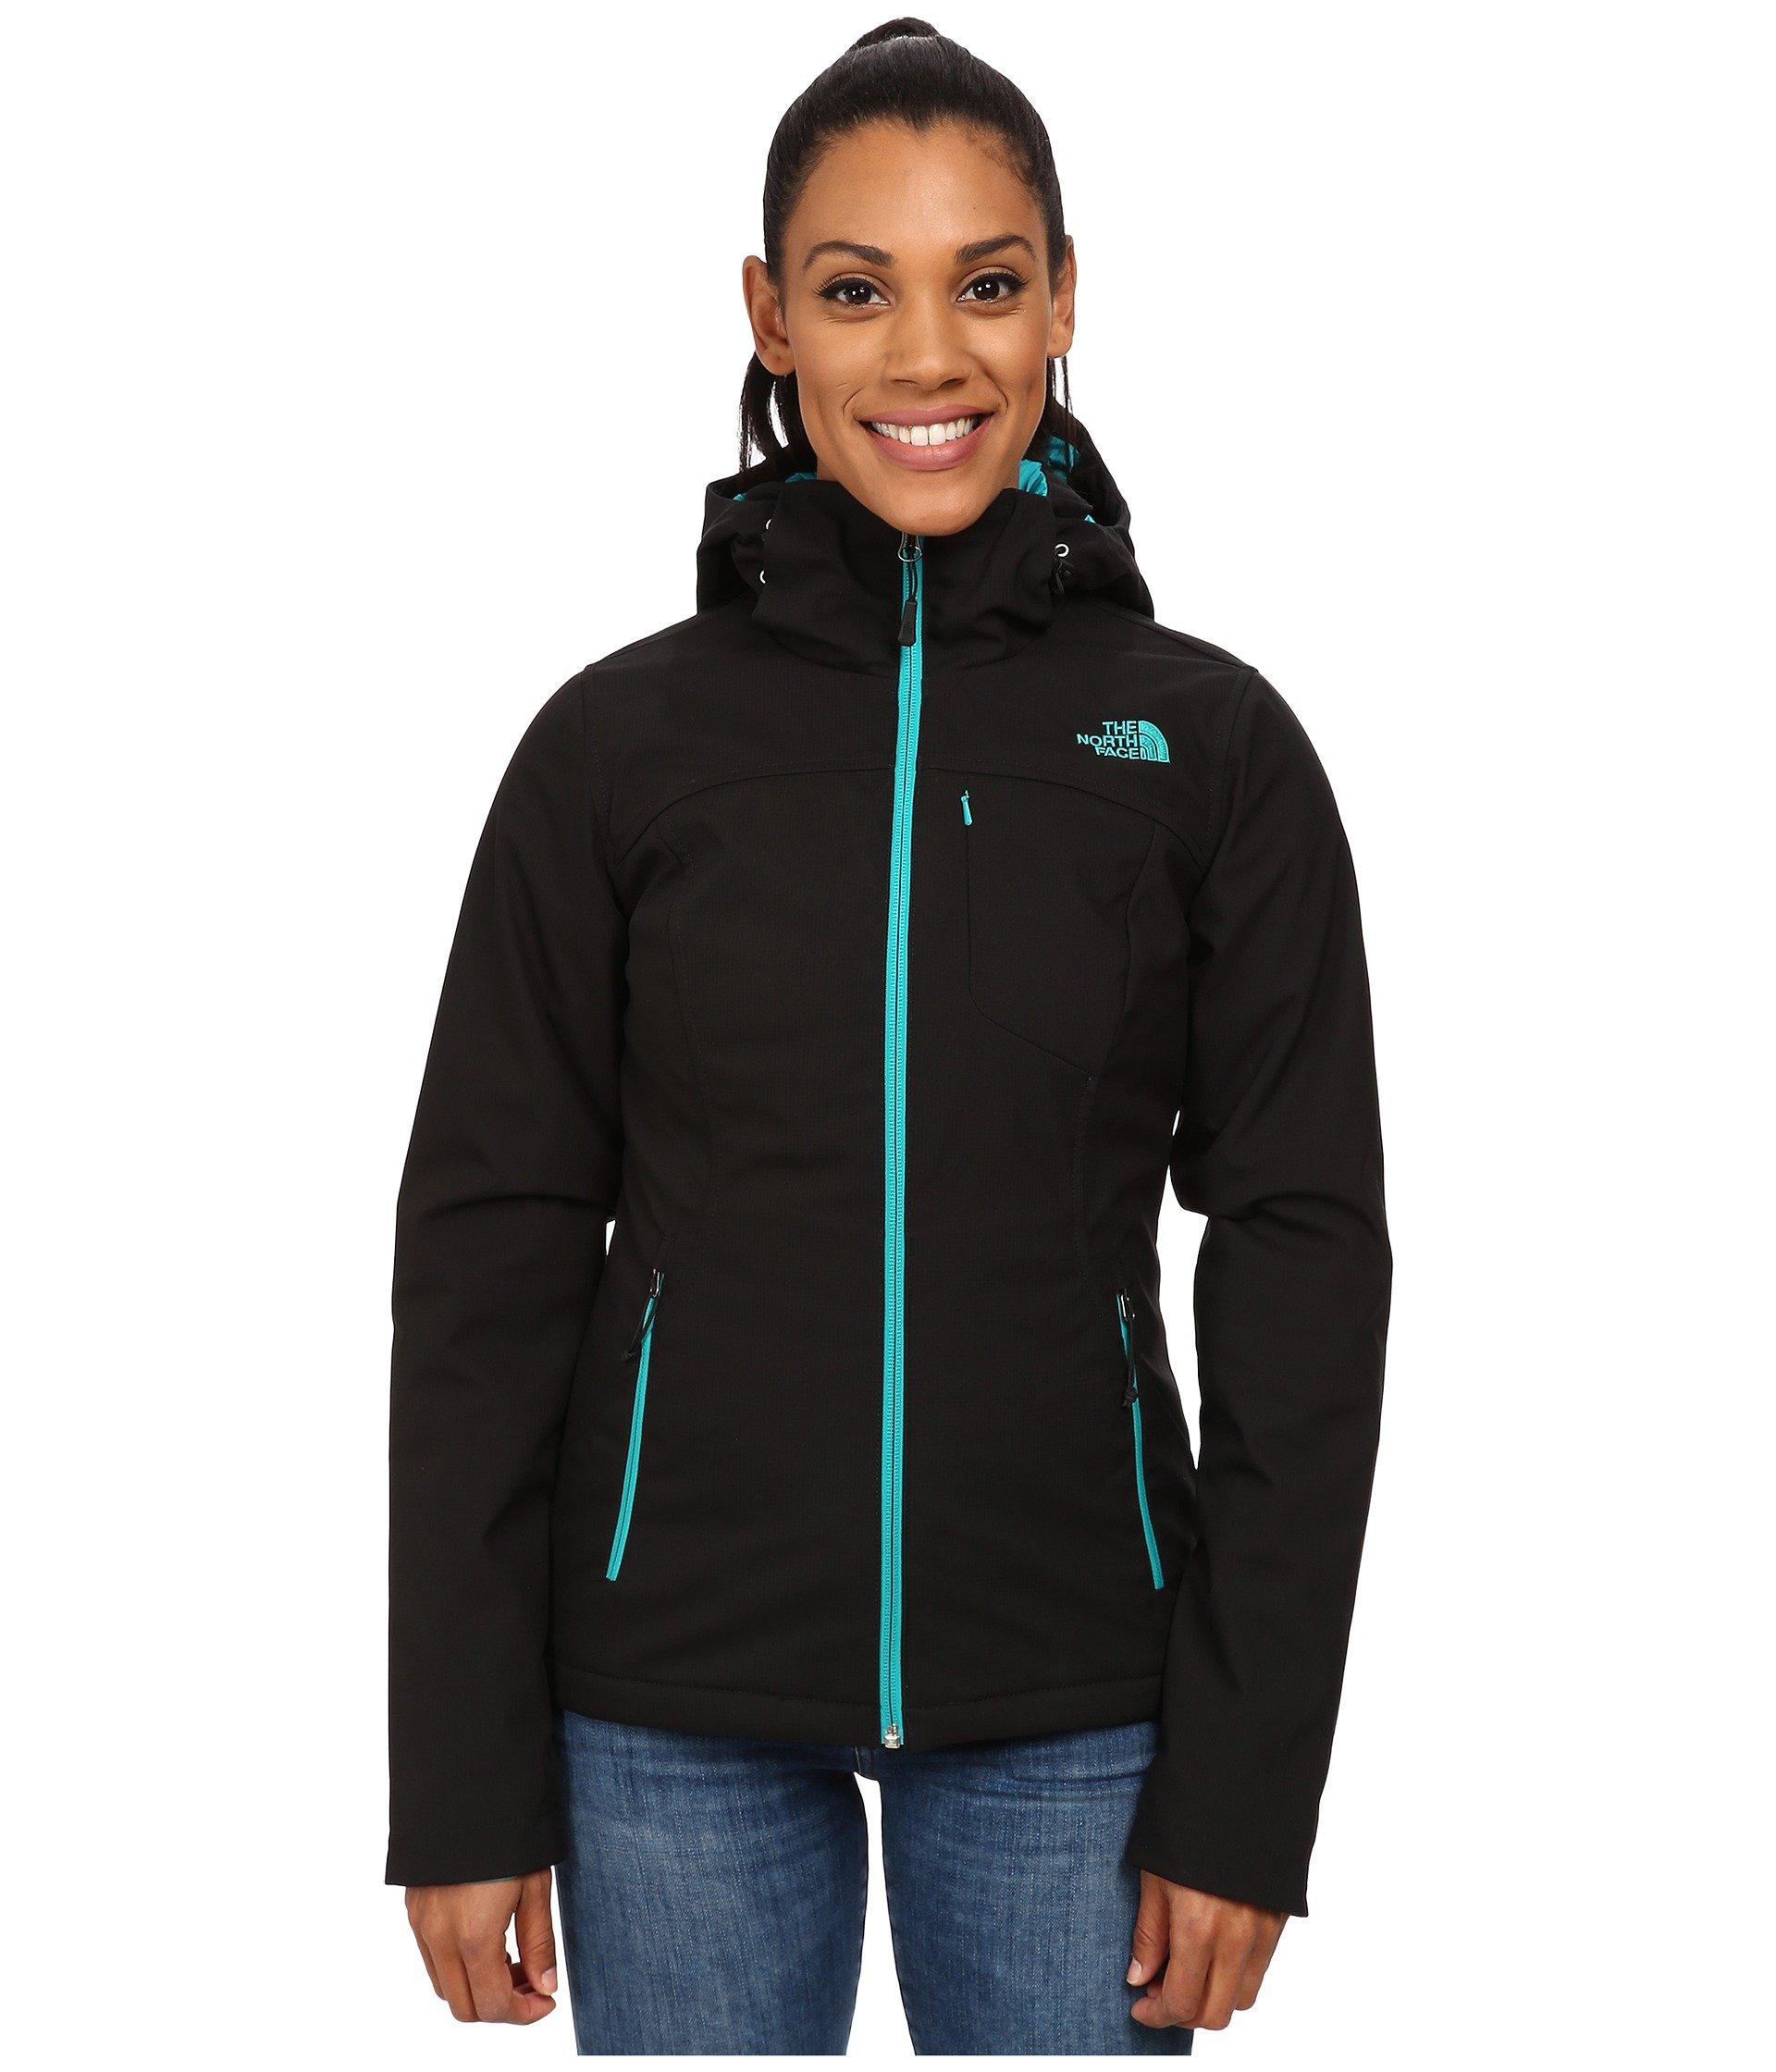 The North Face Apex Elevation Jacket Womens TNF Black/Kokomo Green M